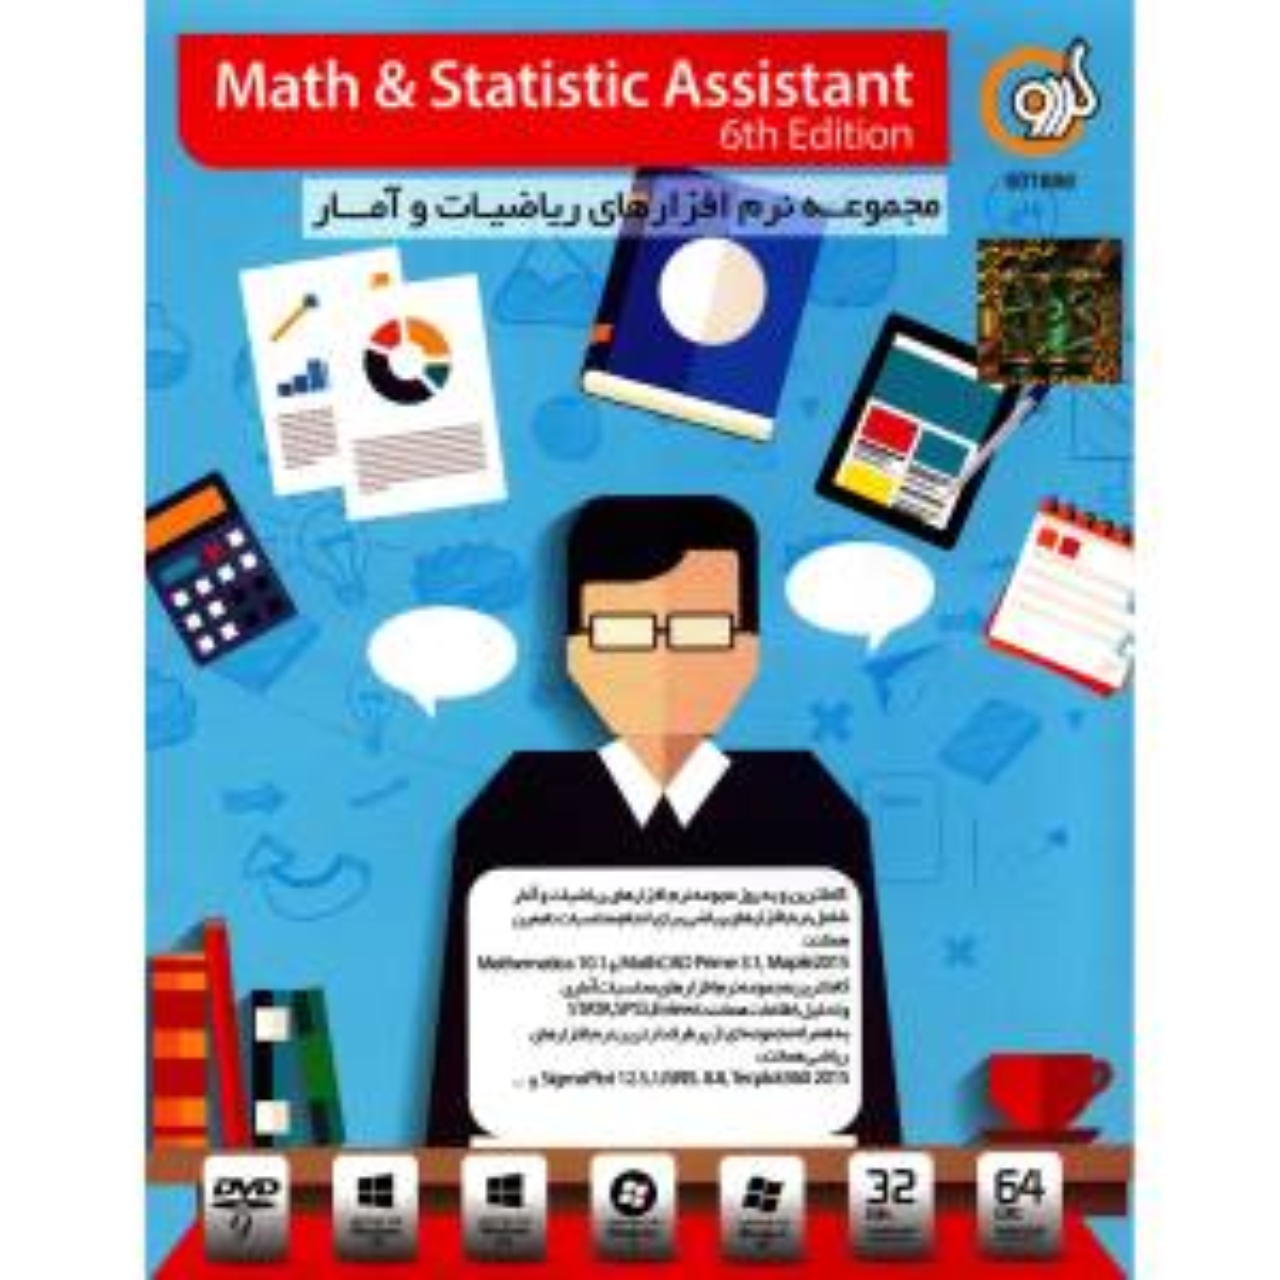 نرم افزار گردو Math And Statistic Assistant 6th Edition